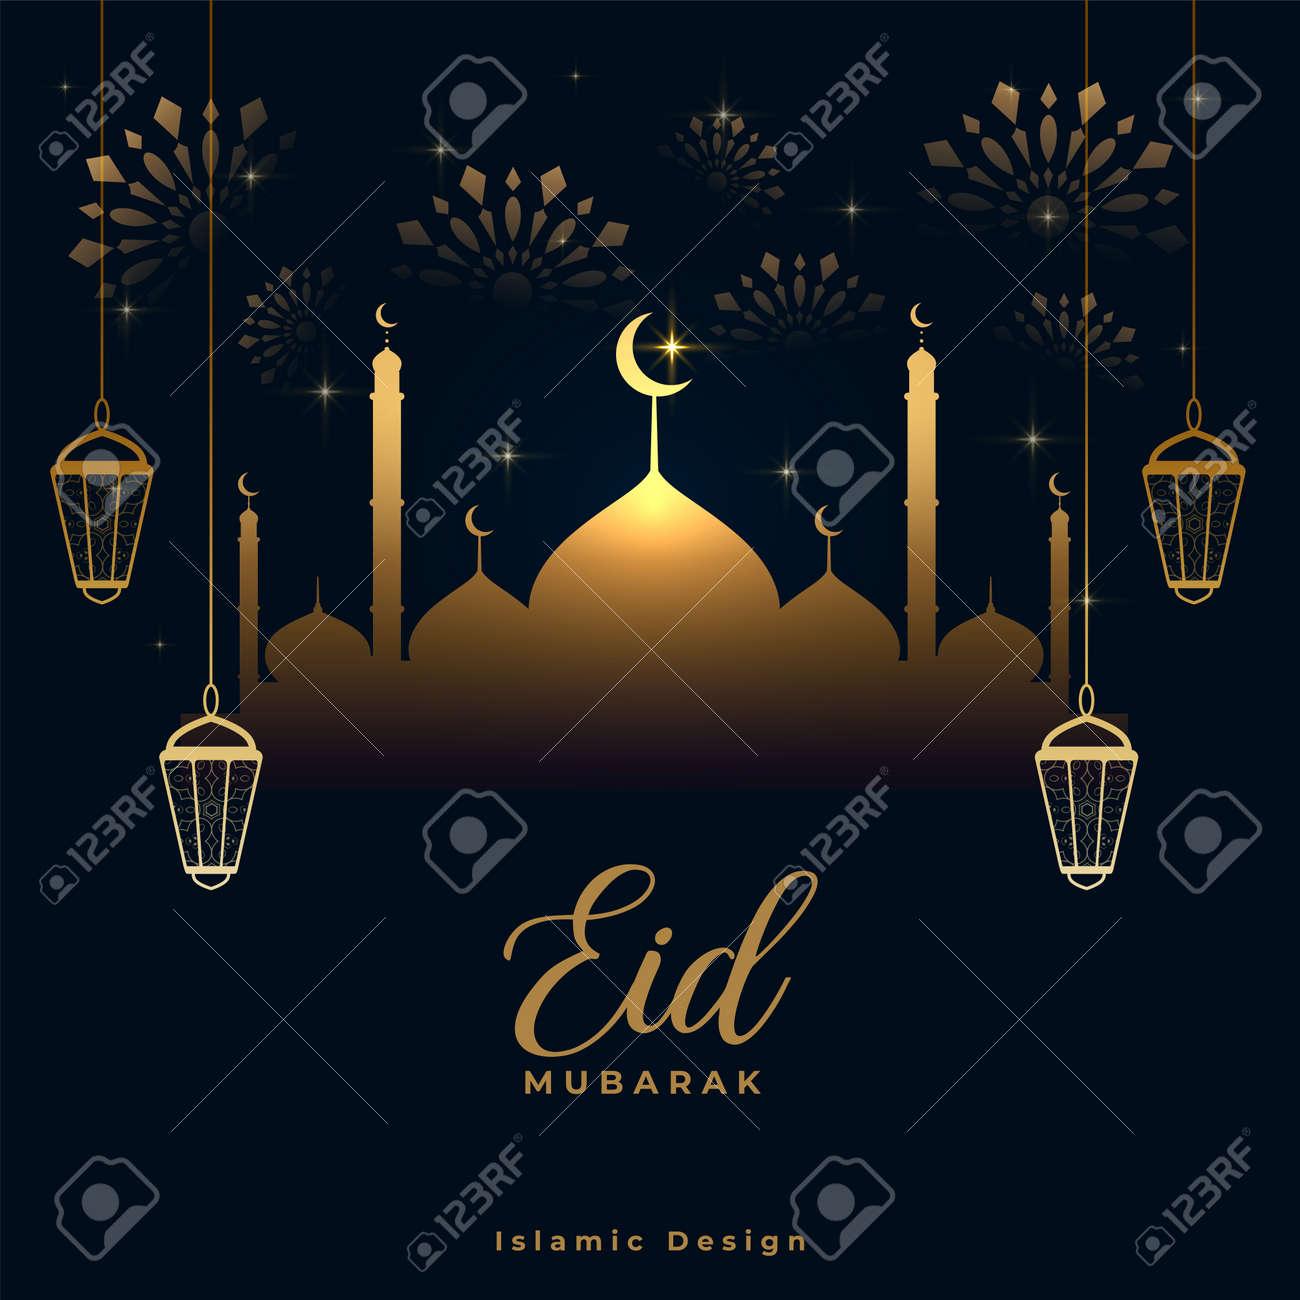 shiny eid mubarak golden and black card design - 167909700